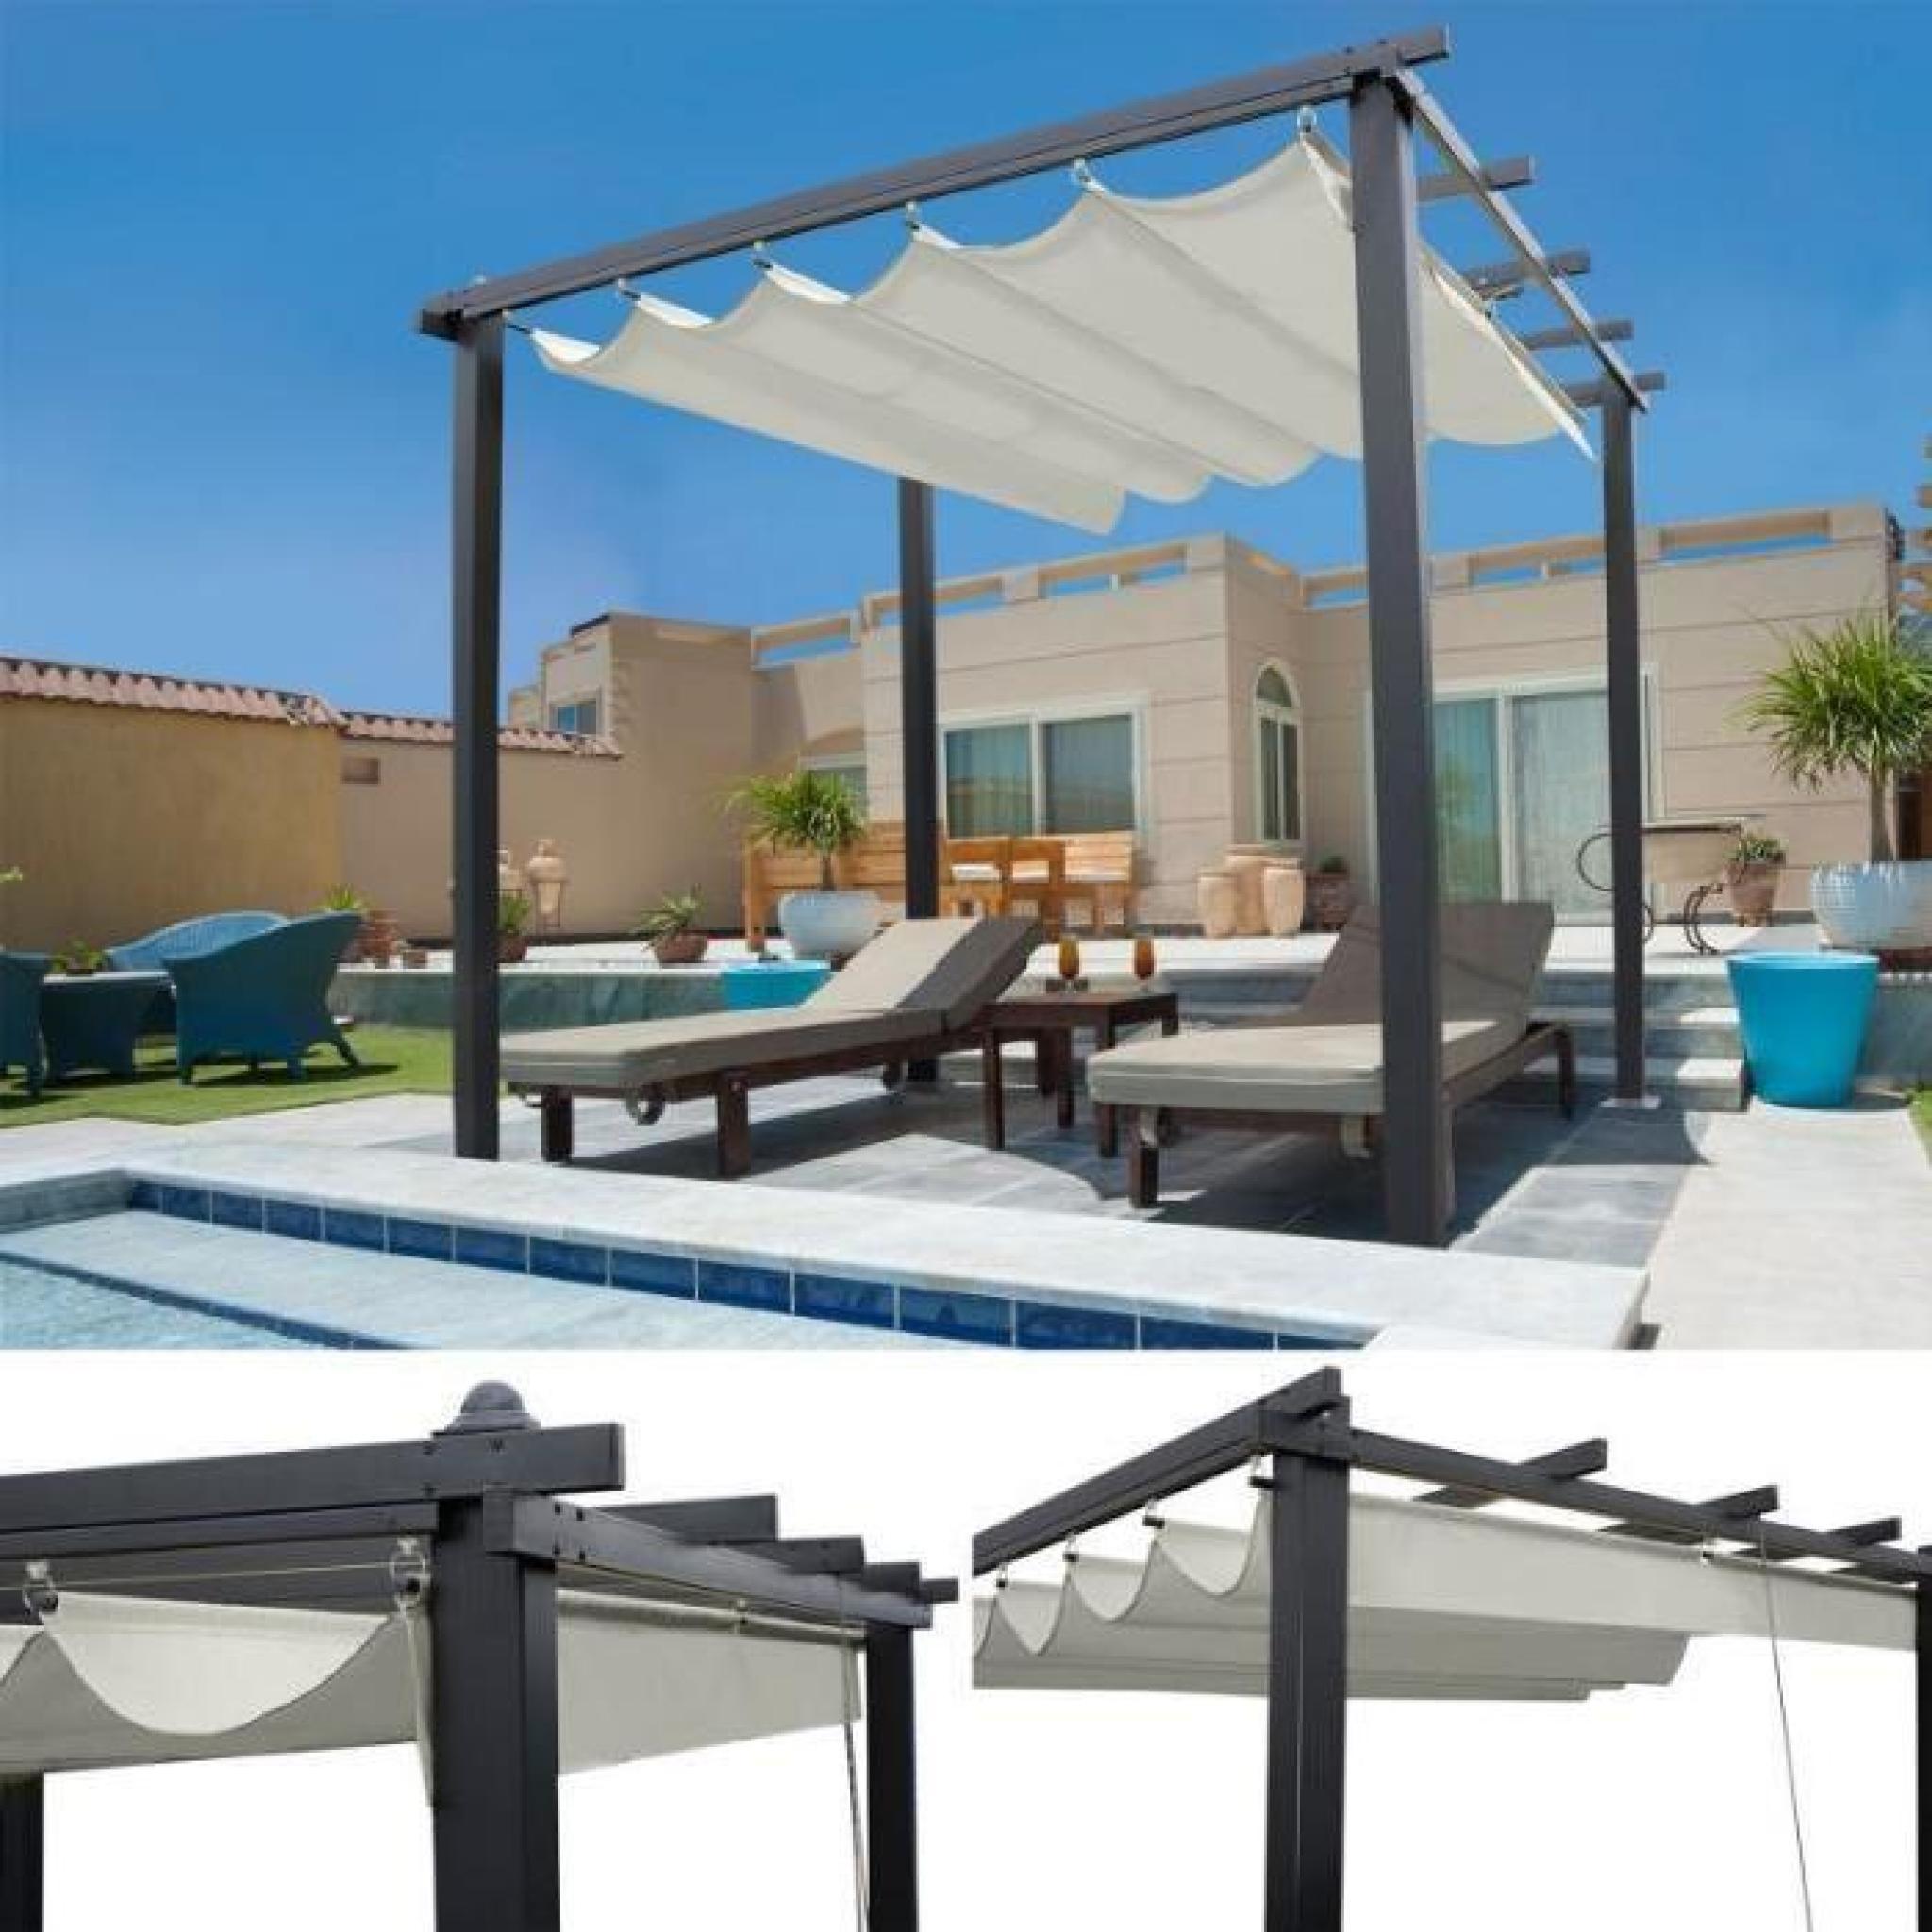 pergola toit r tractable crue tonnelle 4 pieds 3x3m. Black Bedroom Furniture Sets. Home Design Ideas